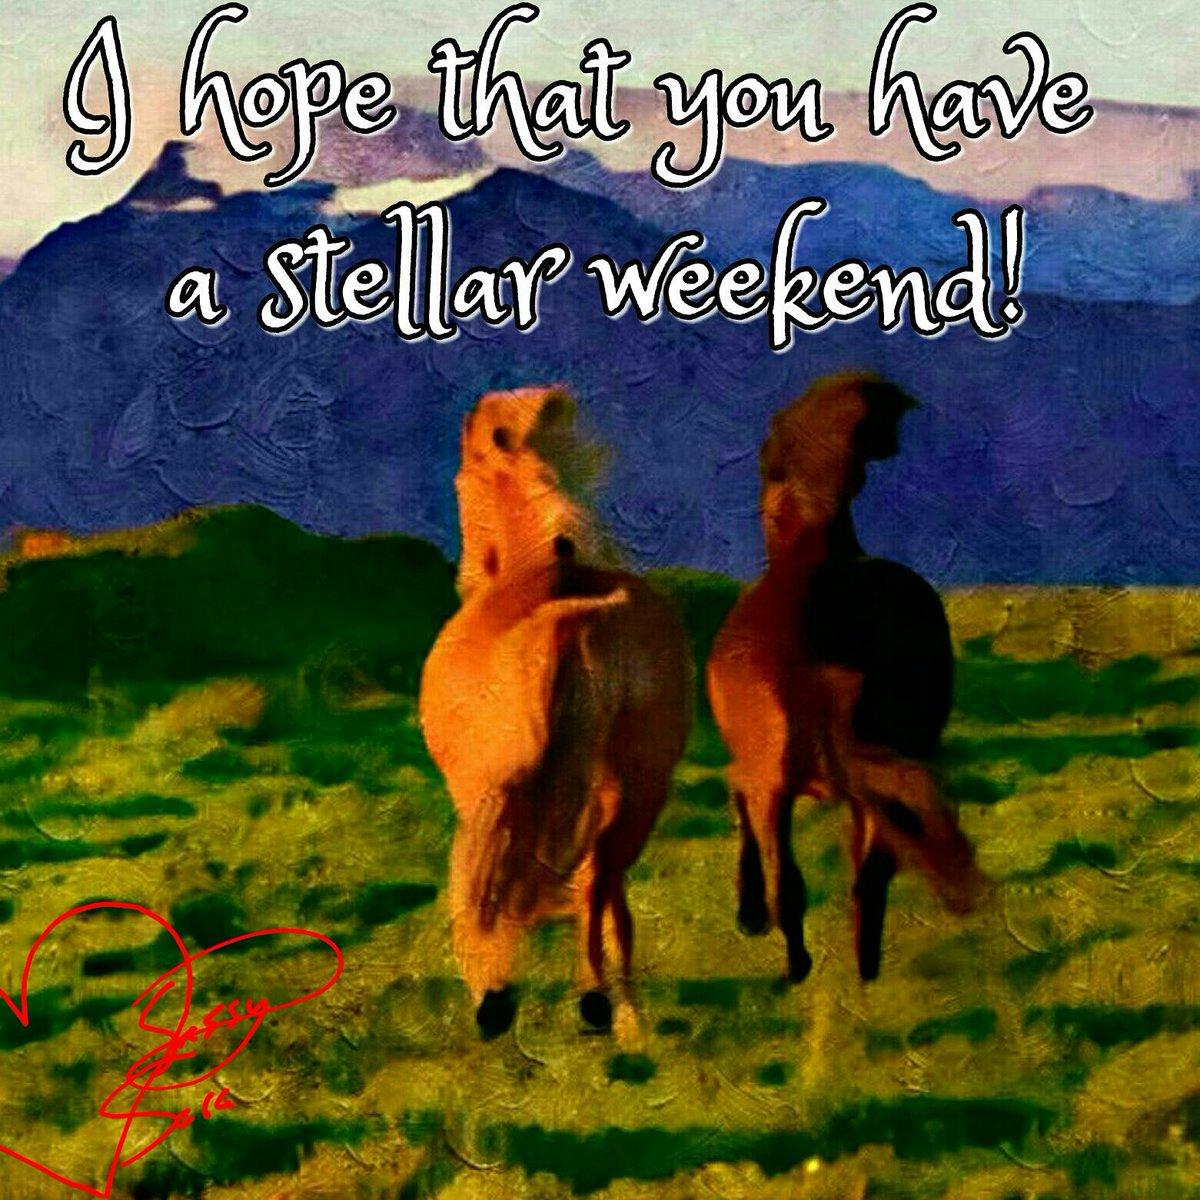 Free at last....💗#friday #fridayvibes #fridays #FridayFun #weekend #weekendvibe #weekendvibes #weekendmood #bornfree #freespirit #horses #horsegirl #horsesoftwitter #whimsical #whimsicalart #running #freeatlast #free #freedom #mountains #stunning #heavensent #beautiful #pretty